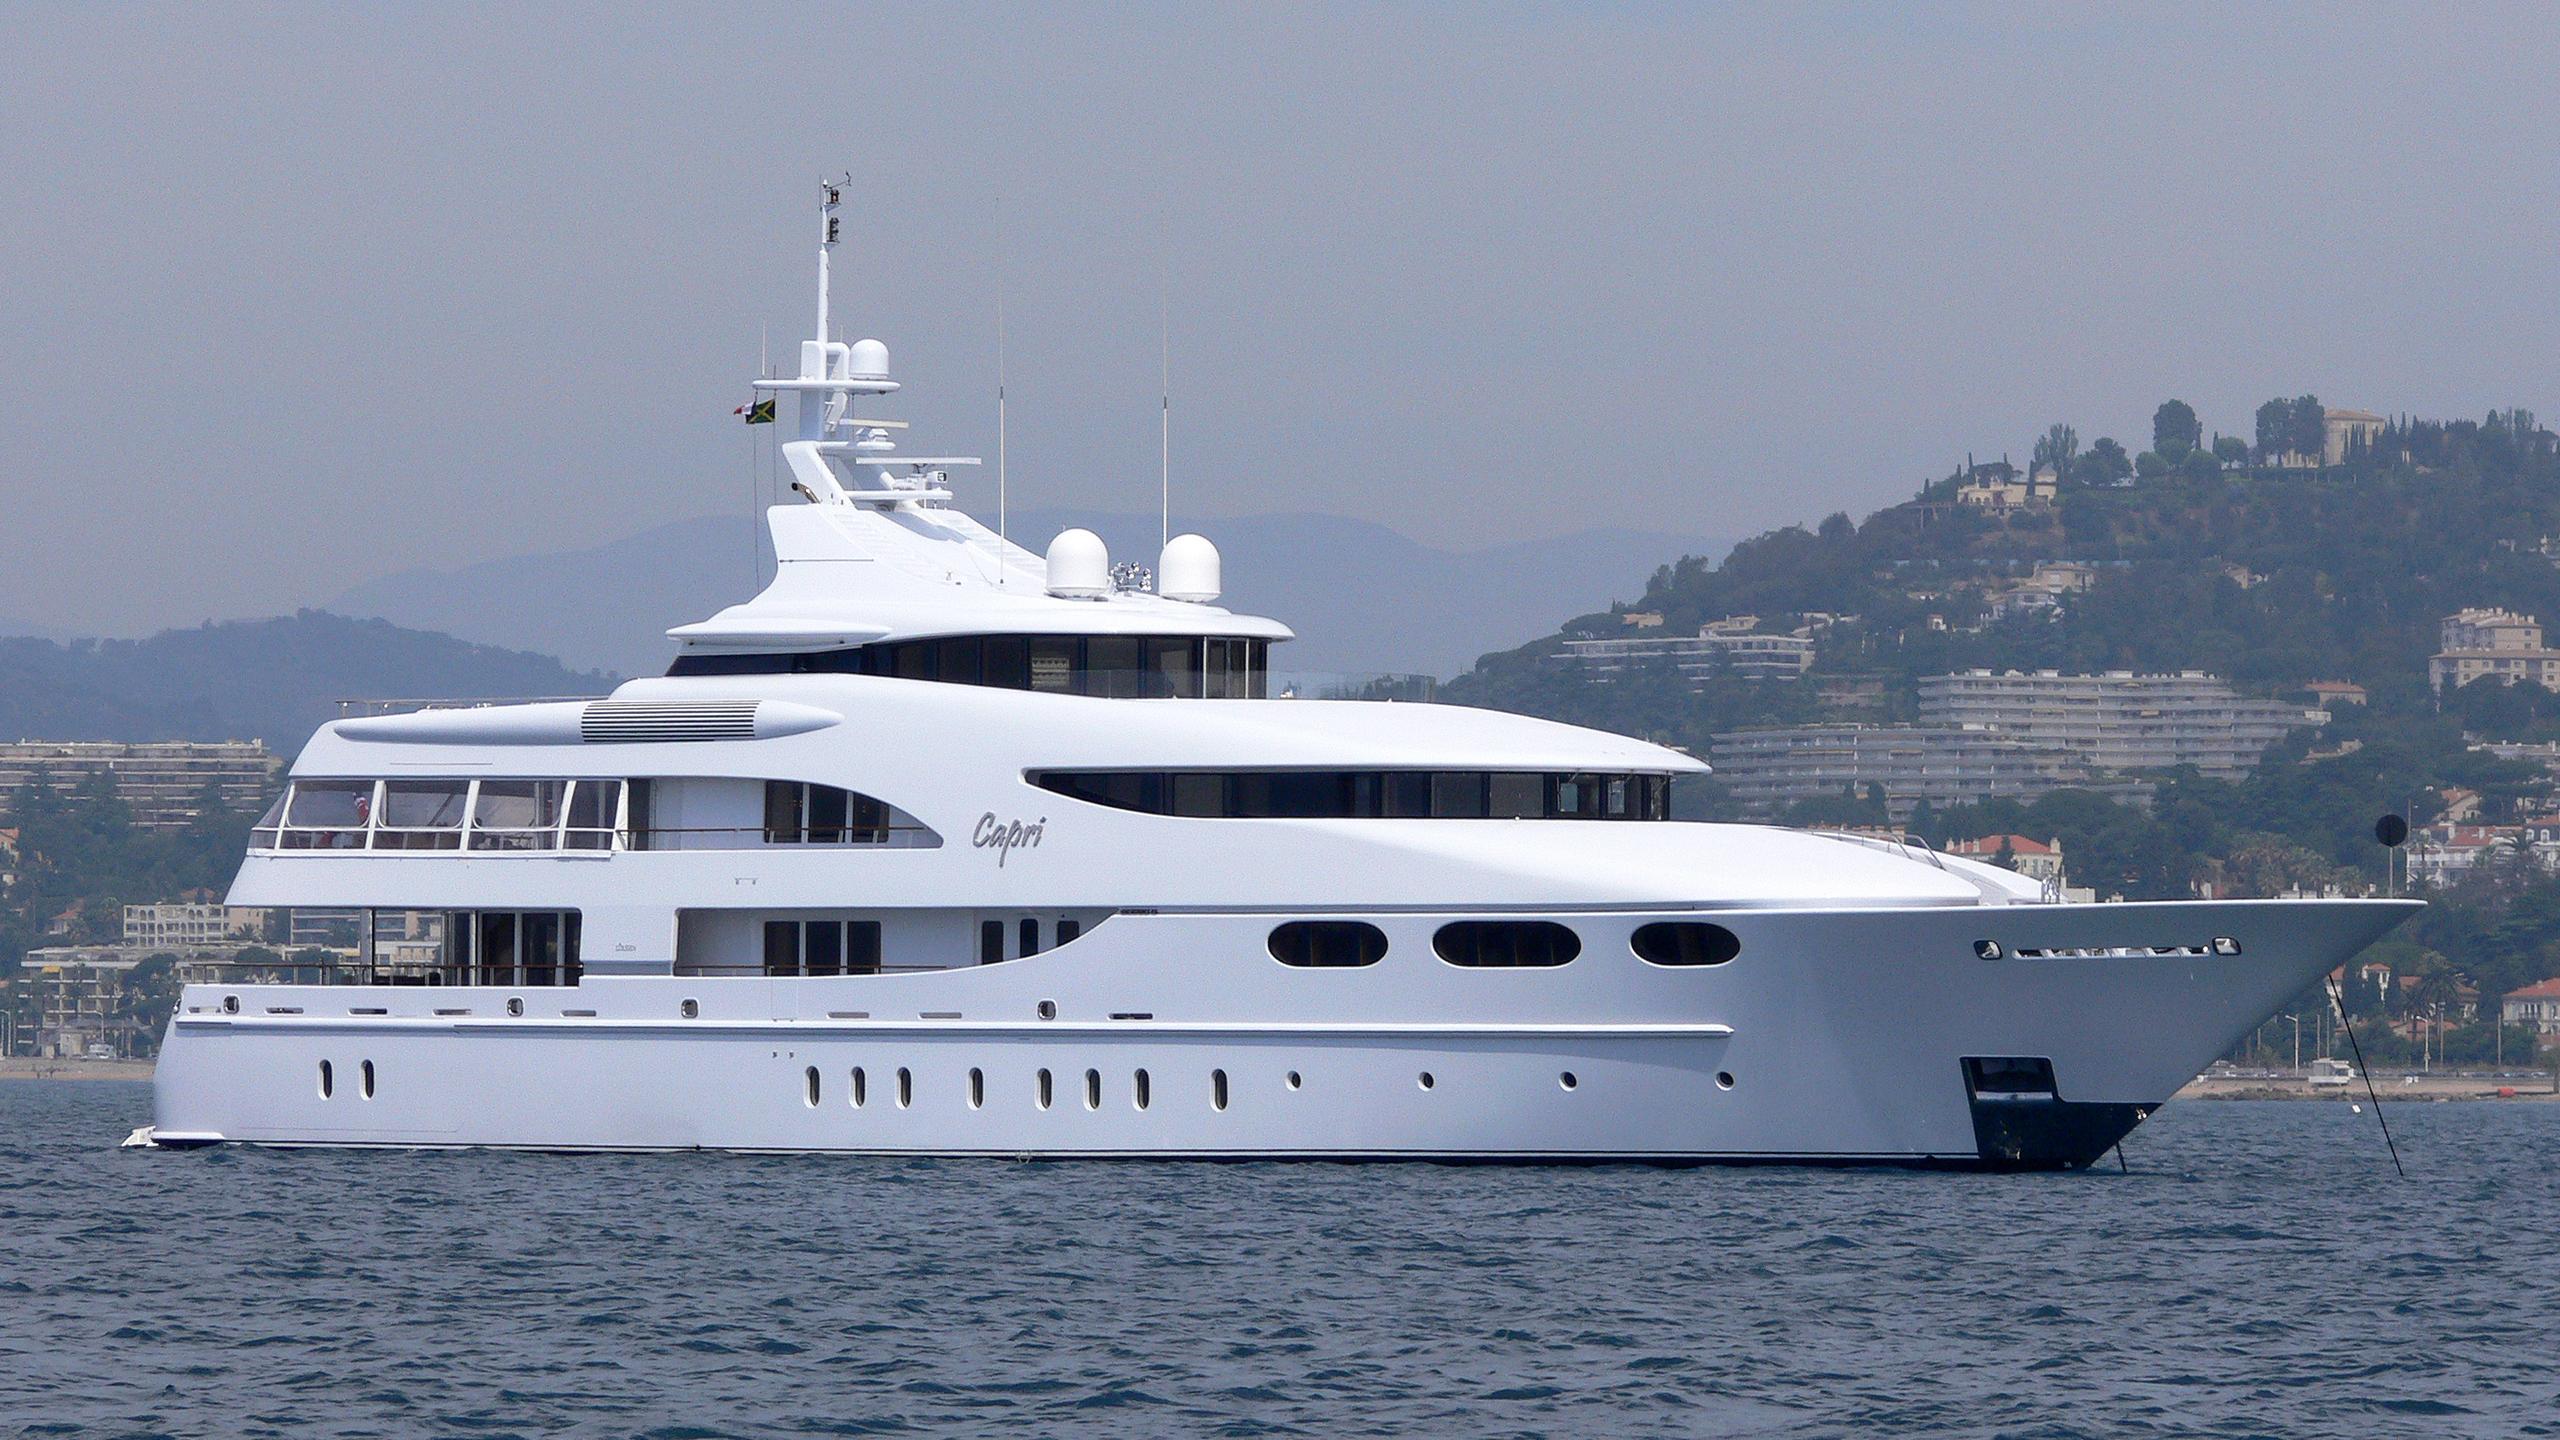 capri-yacht-exterior